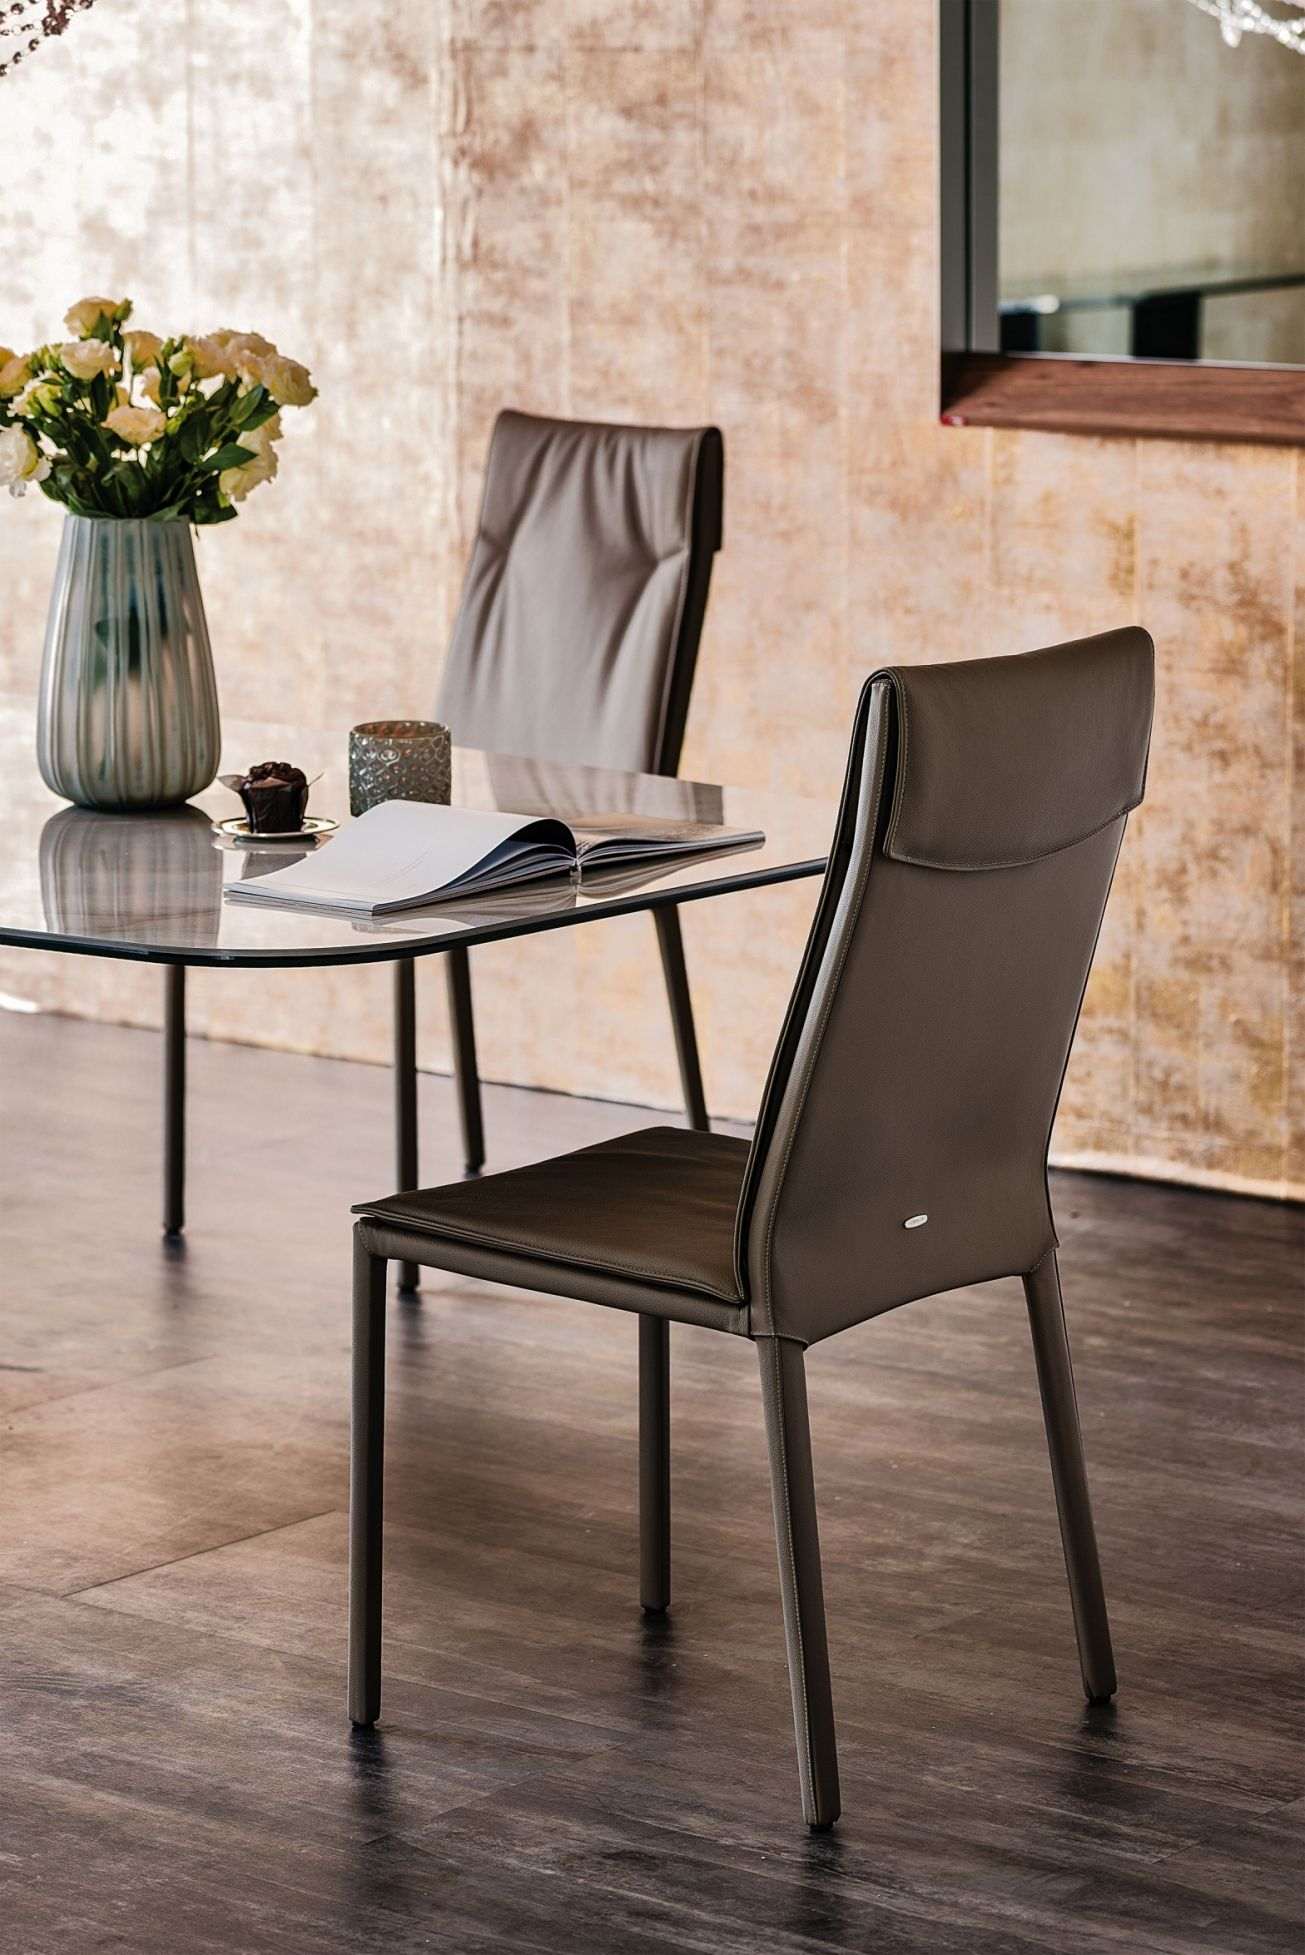 Agatha Flex Dining Chair Dining chairs, Furniture design